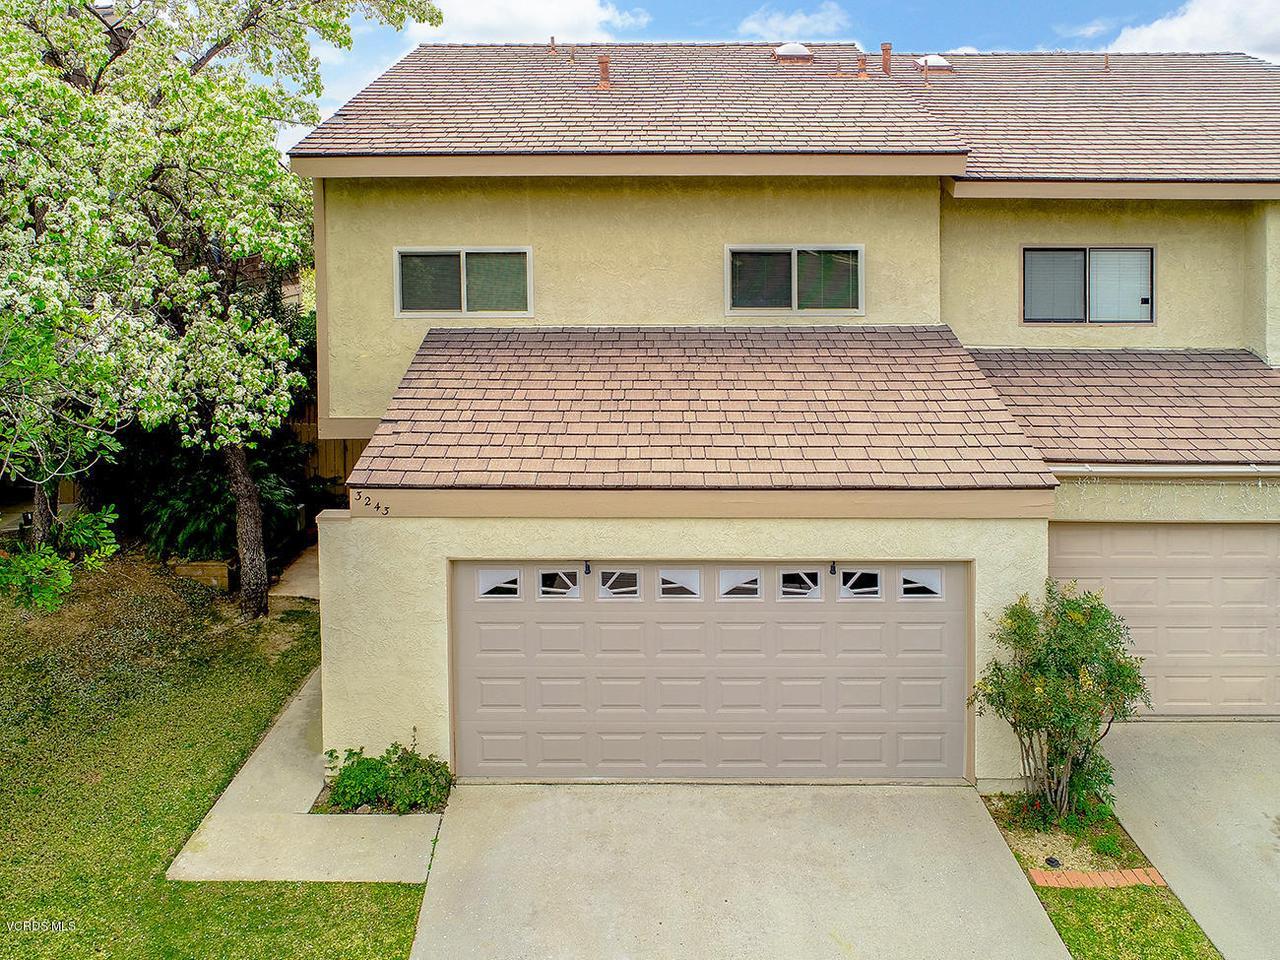 3243 SUNBURST, Thousand Oaks, CA 91360 - aaAerials1